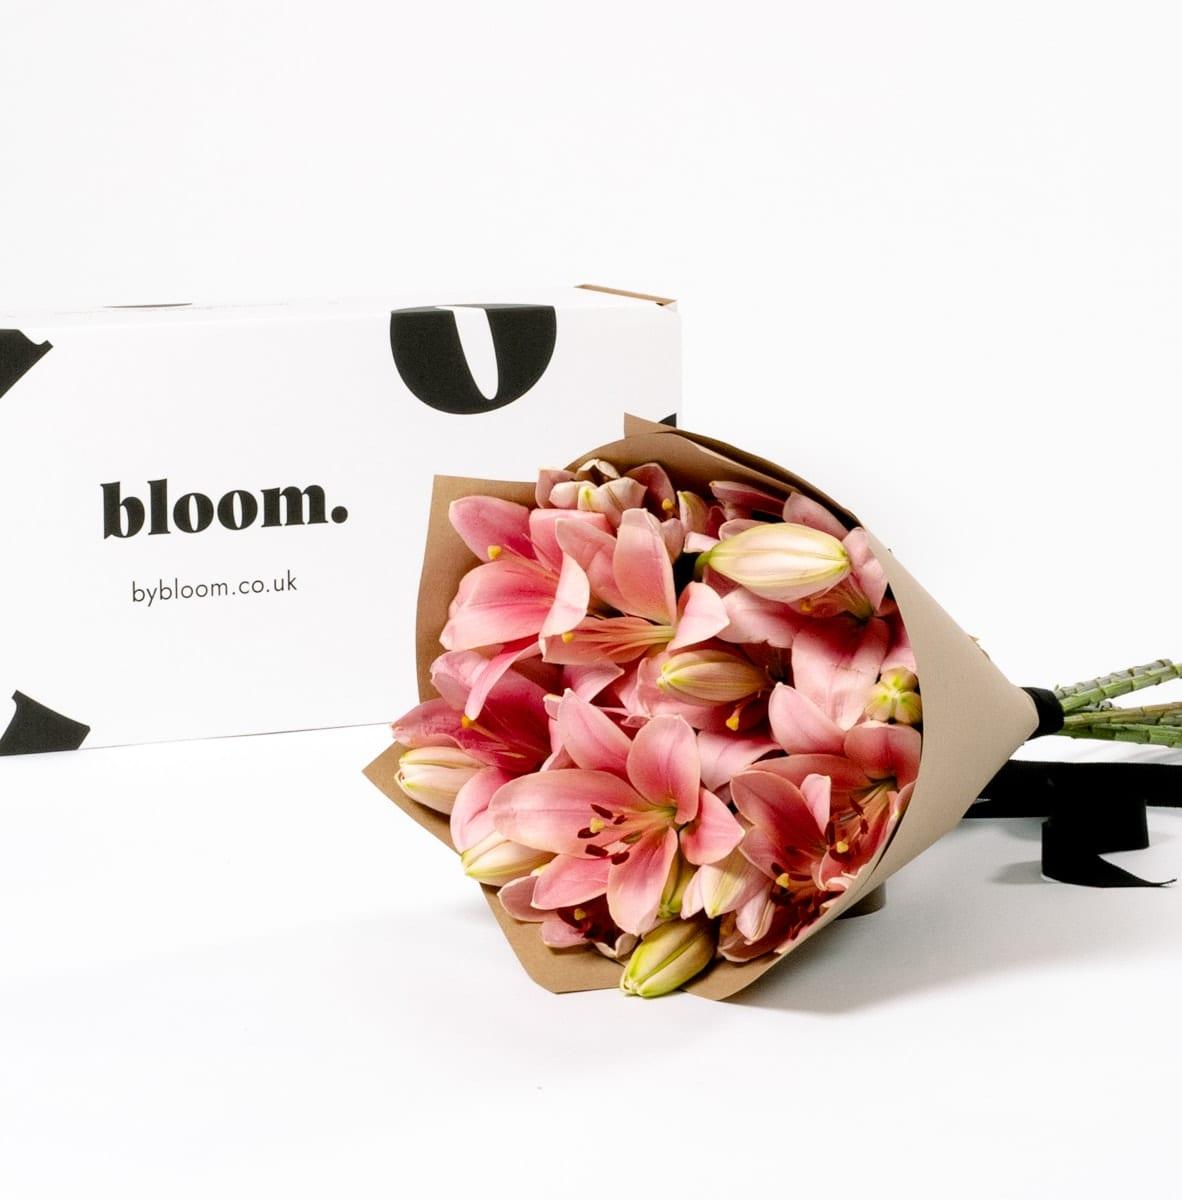 Bloom Flower Delivery | Ballet Slipper Pink Lily